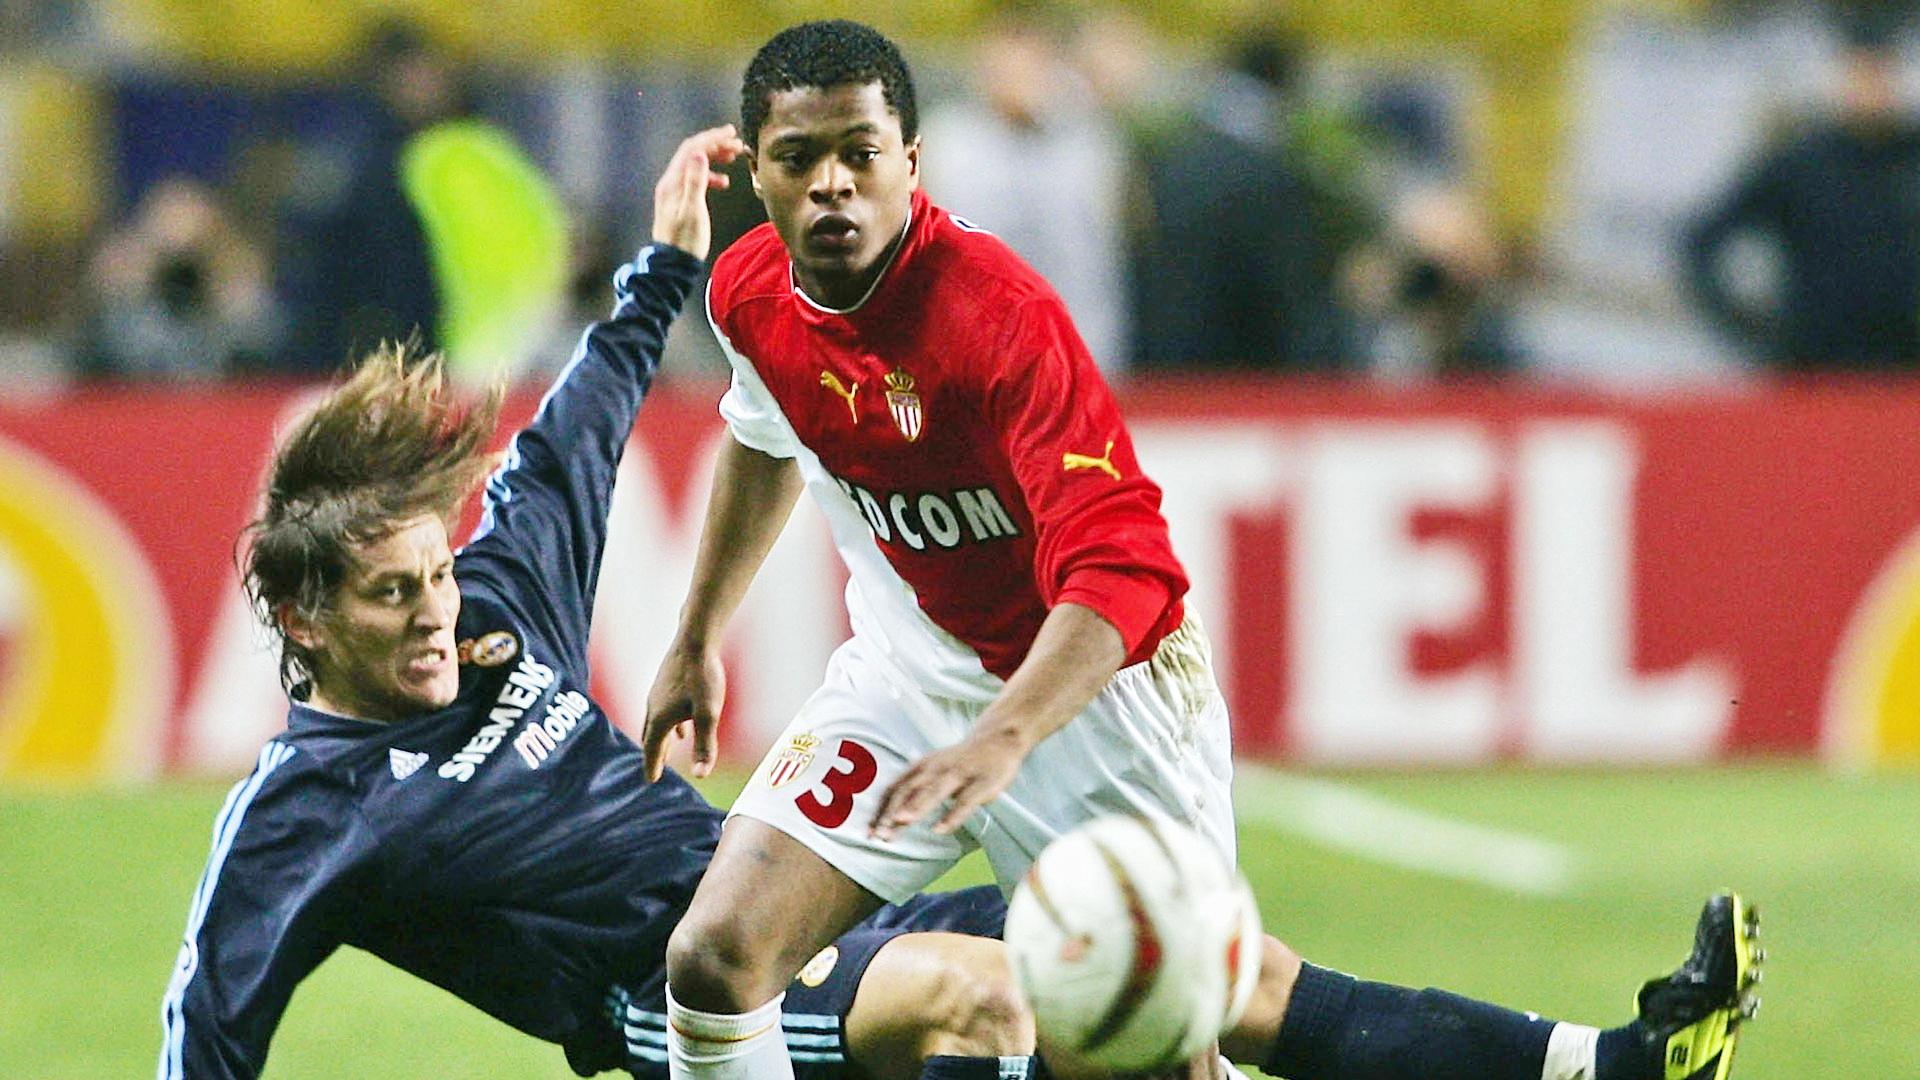 Patrice Evra Monaco Michel Salgado Real Madrid Champions League